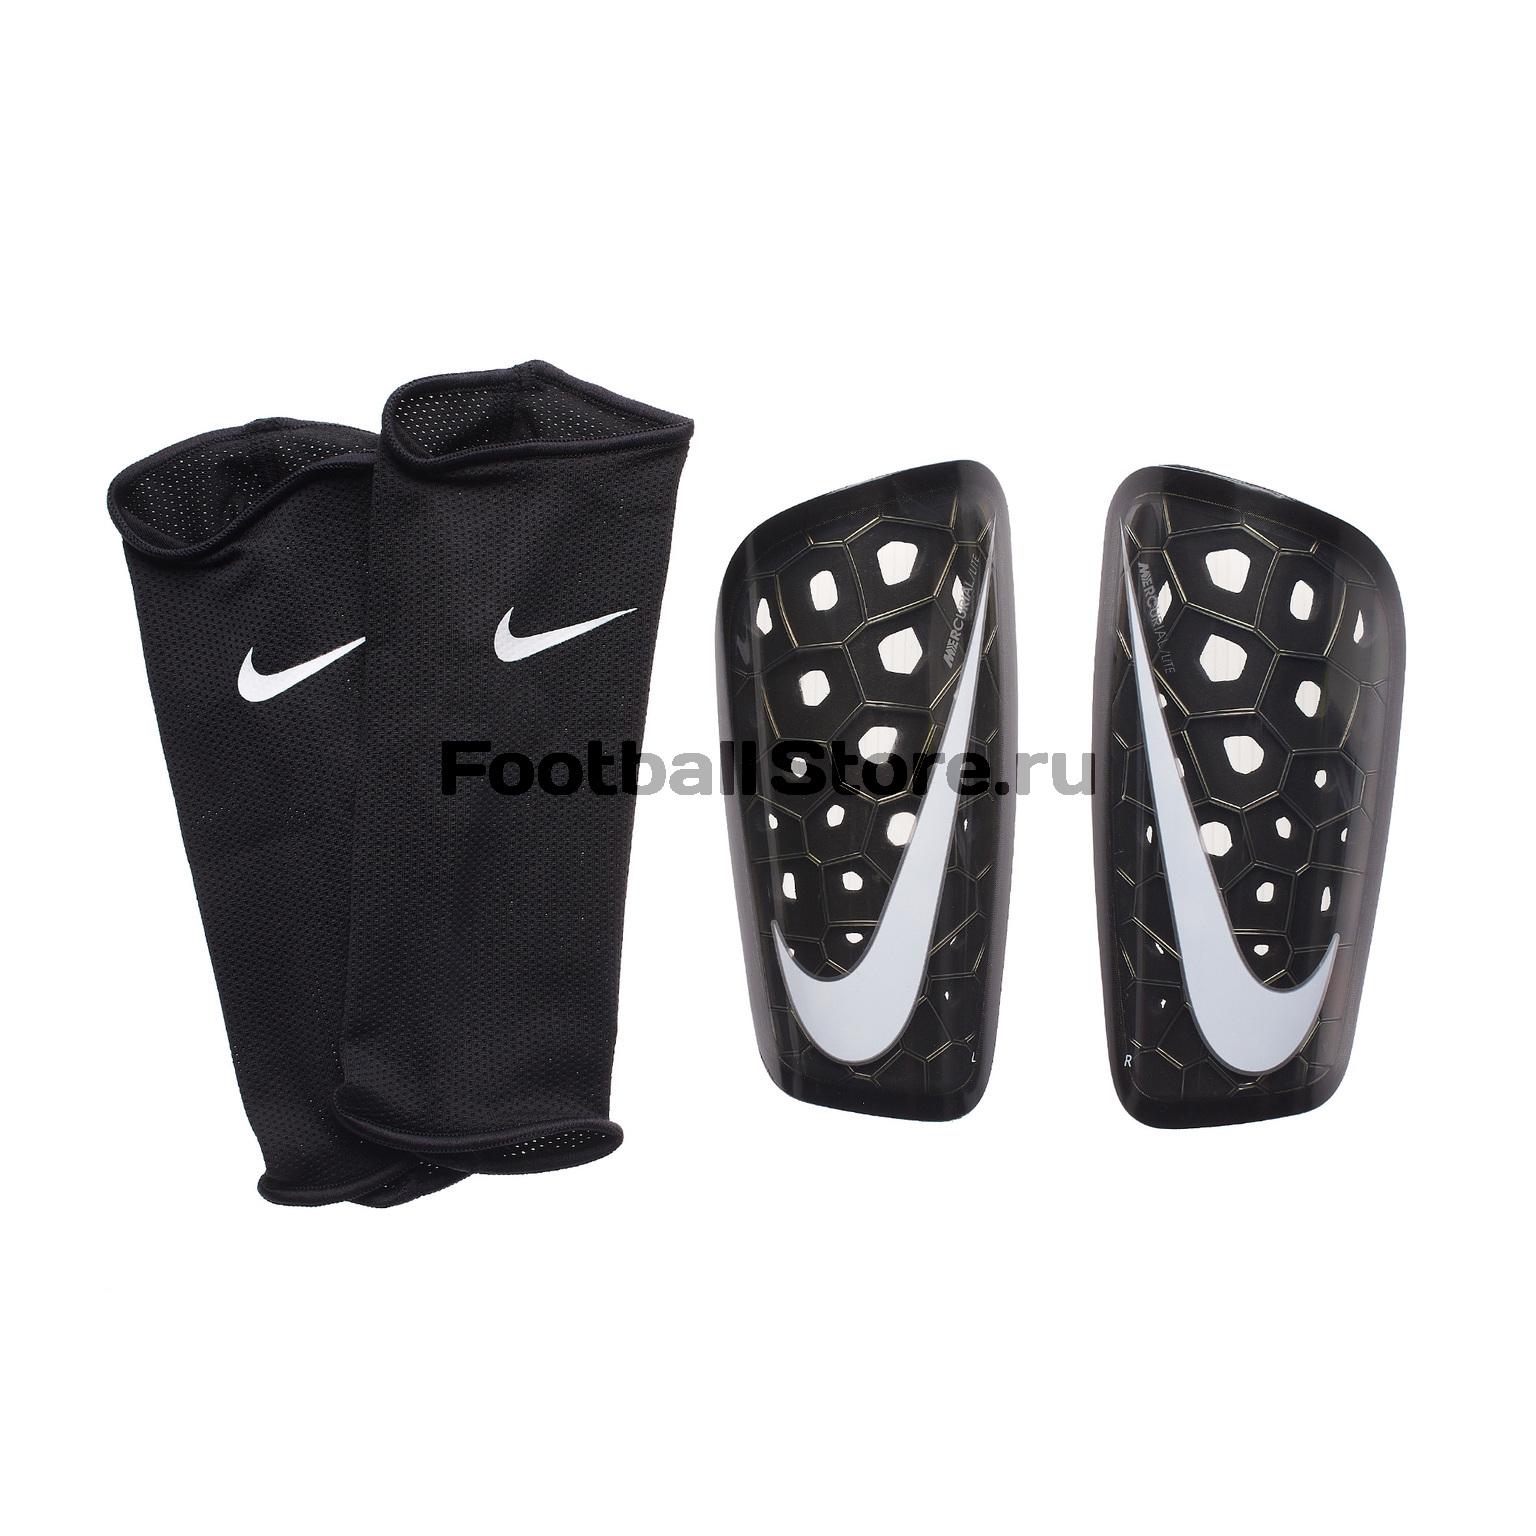 Щитки Nike Mercurial Lite GRD SP2120-010 щитки nike mercurial lite superlock sp2163 702